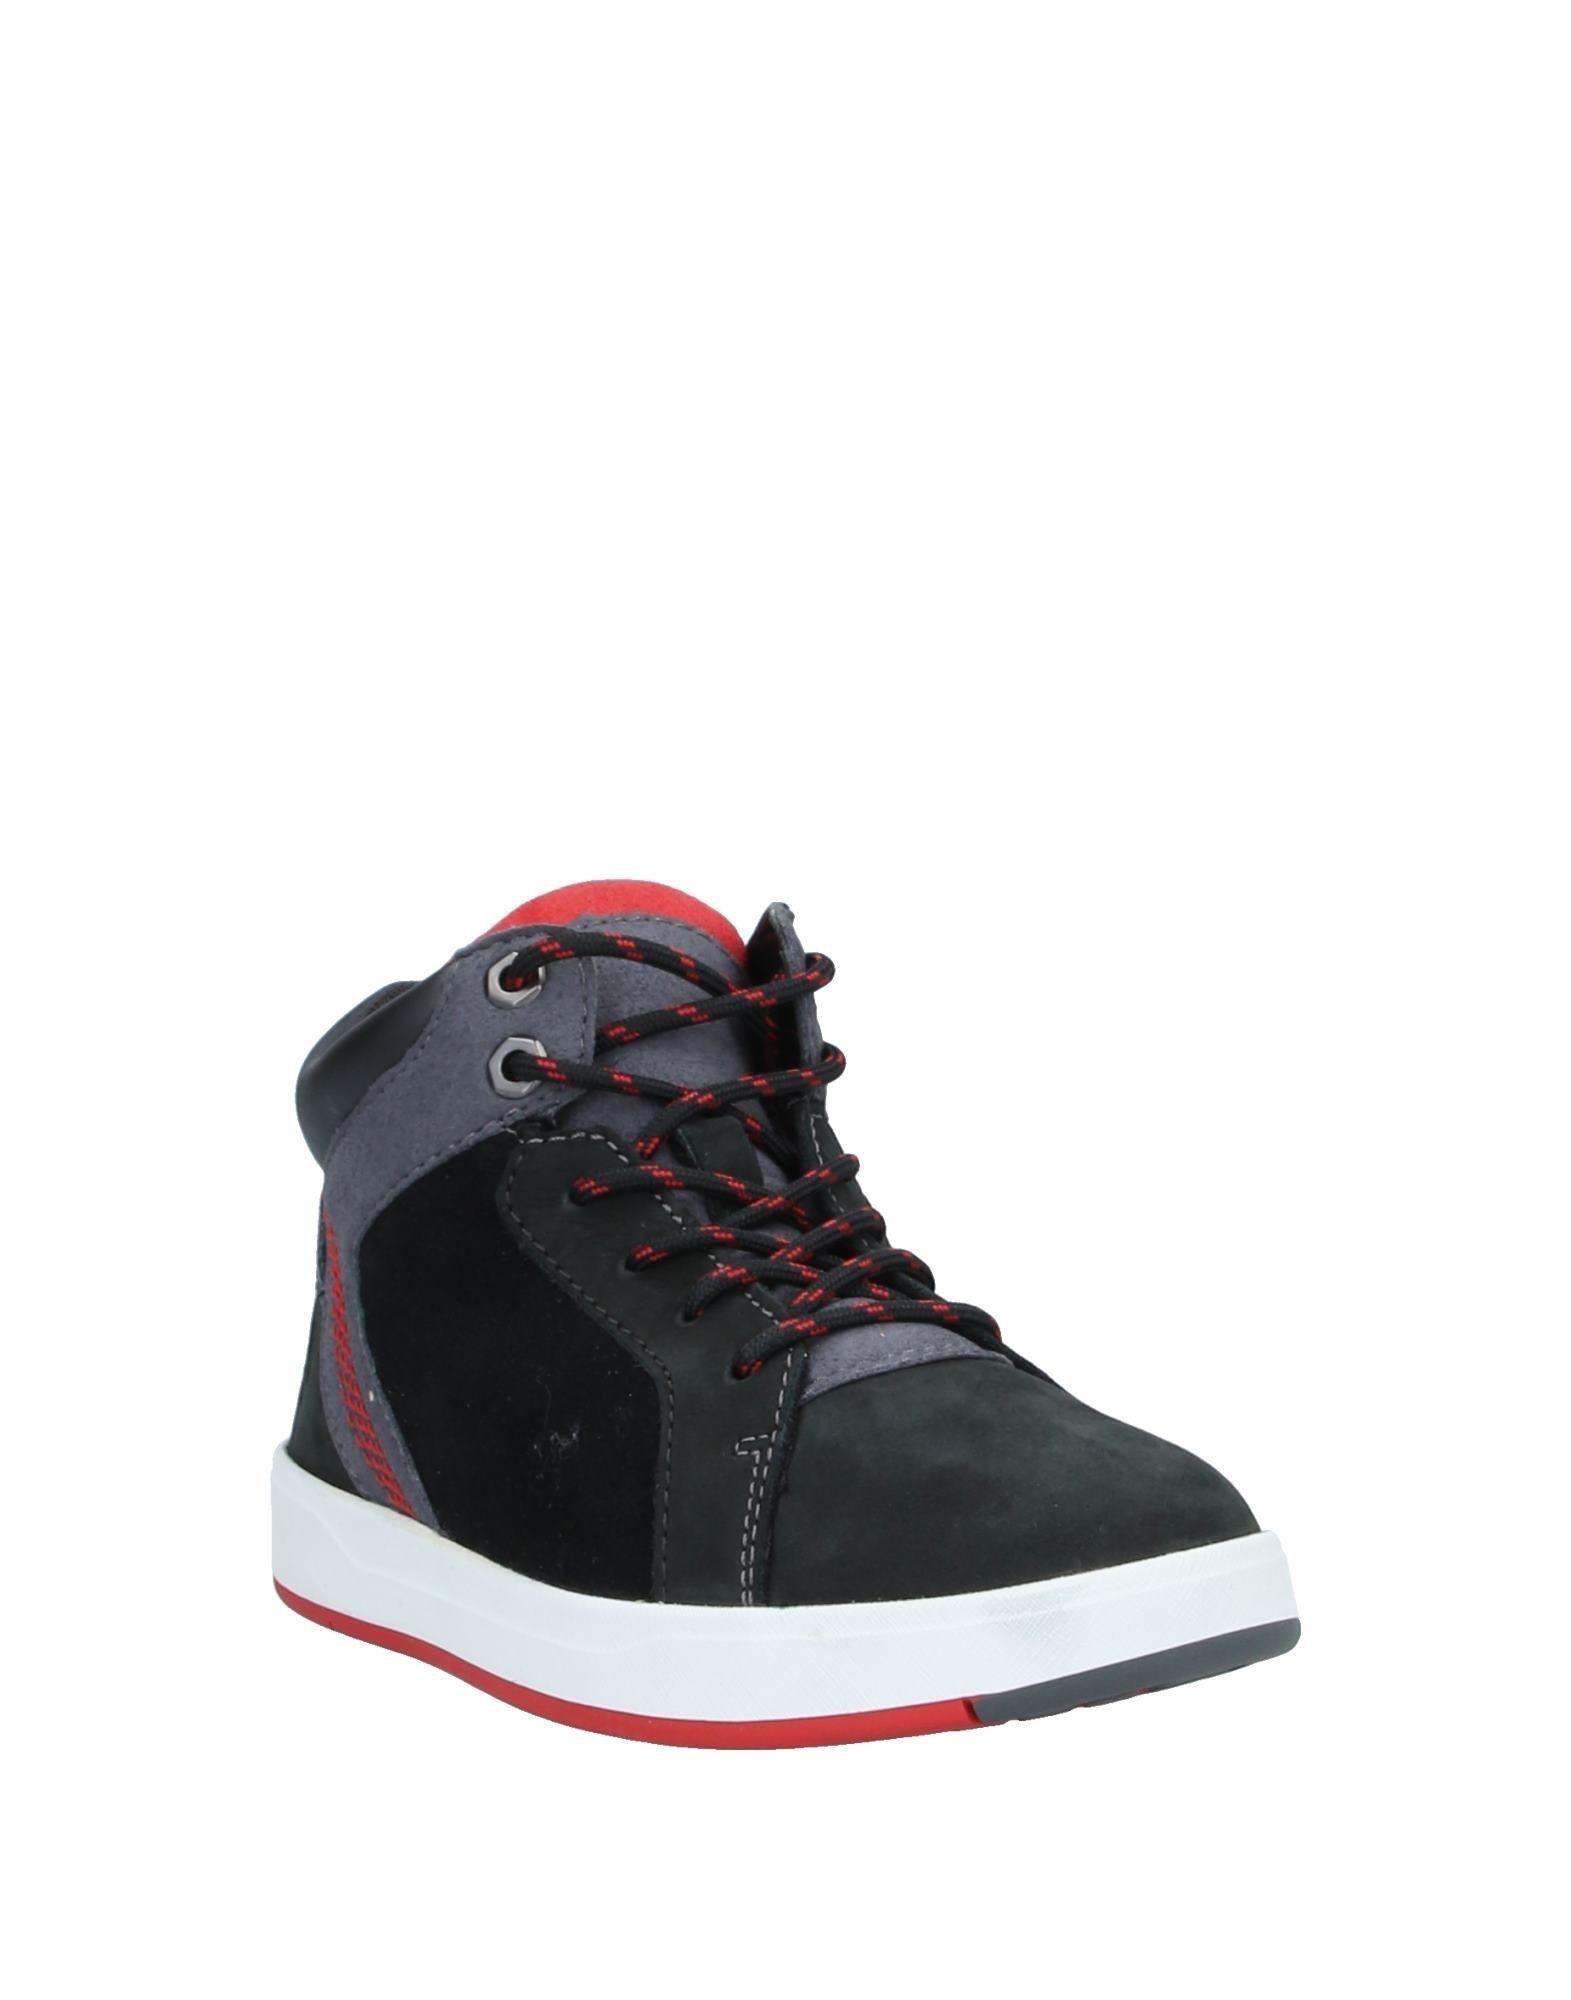 Timberland - Footwear - High-tops & Sneakers - On Yoox.com